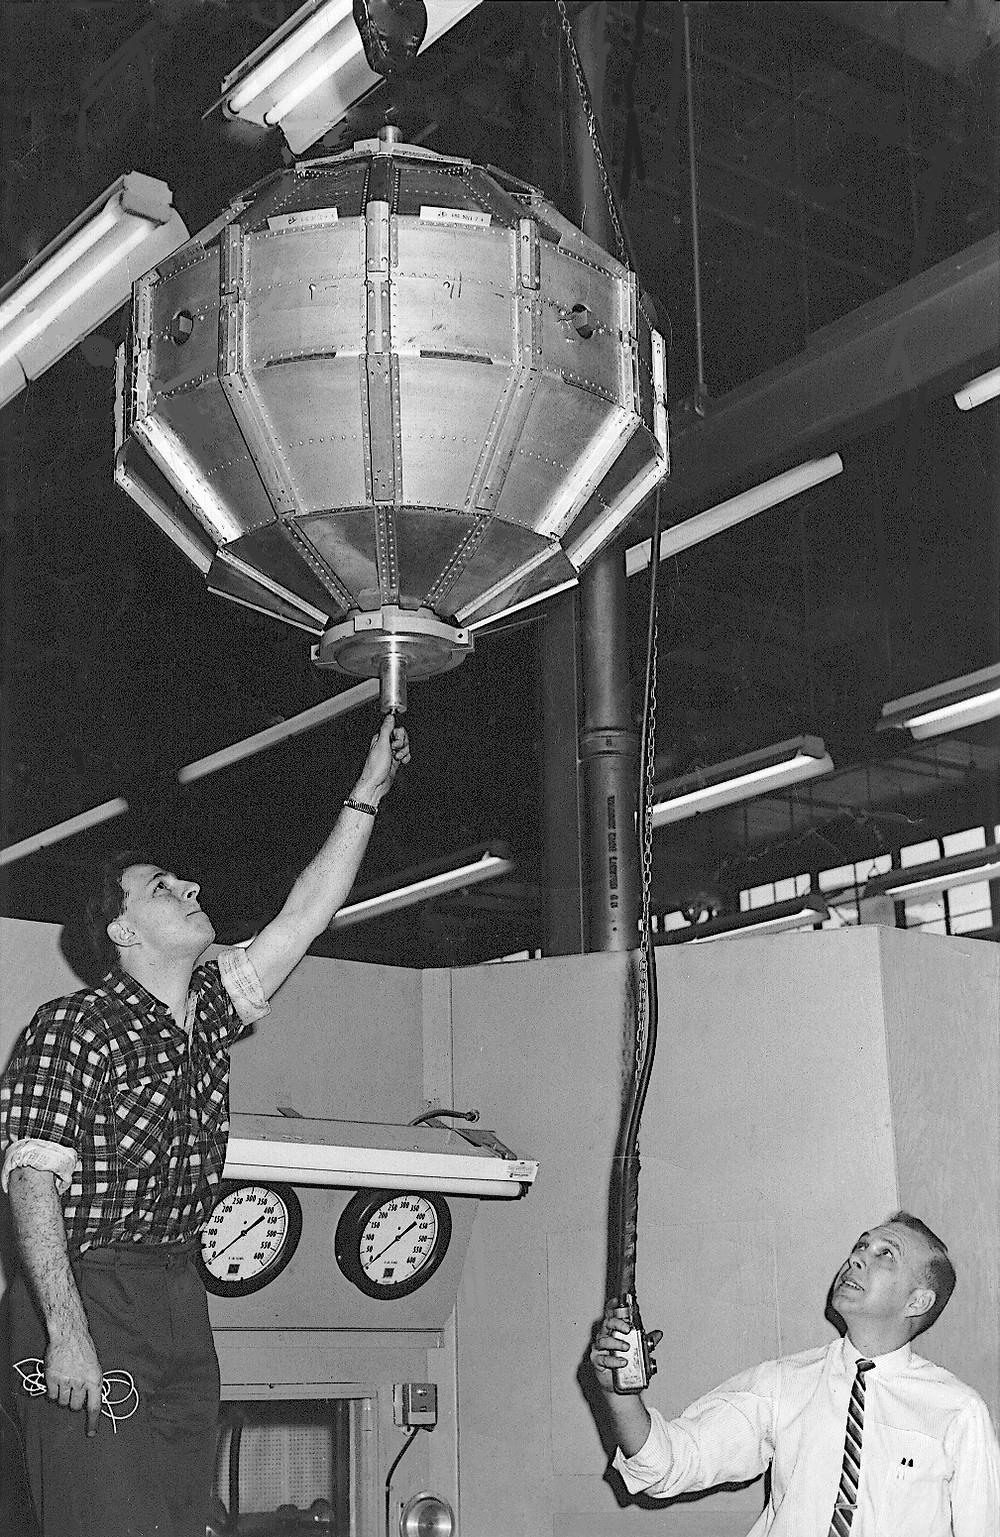 The de Havilland team at work on the Alouette Satellite